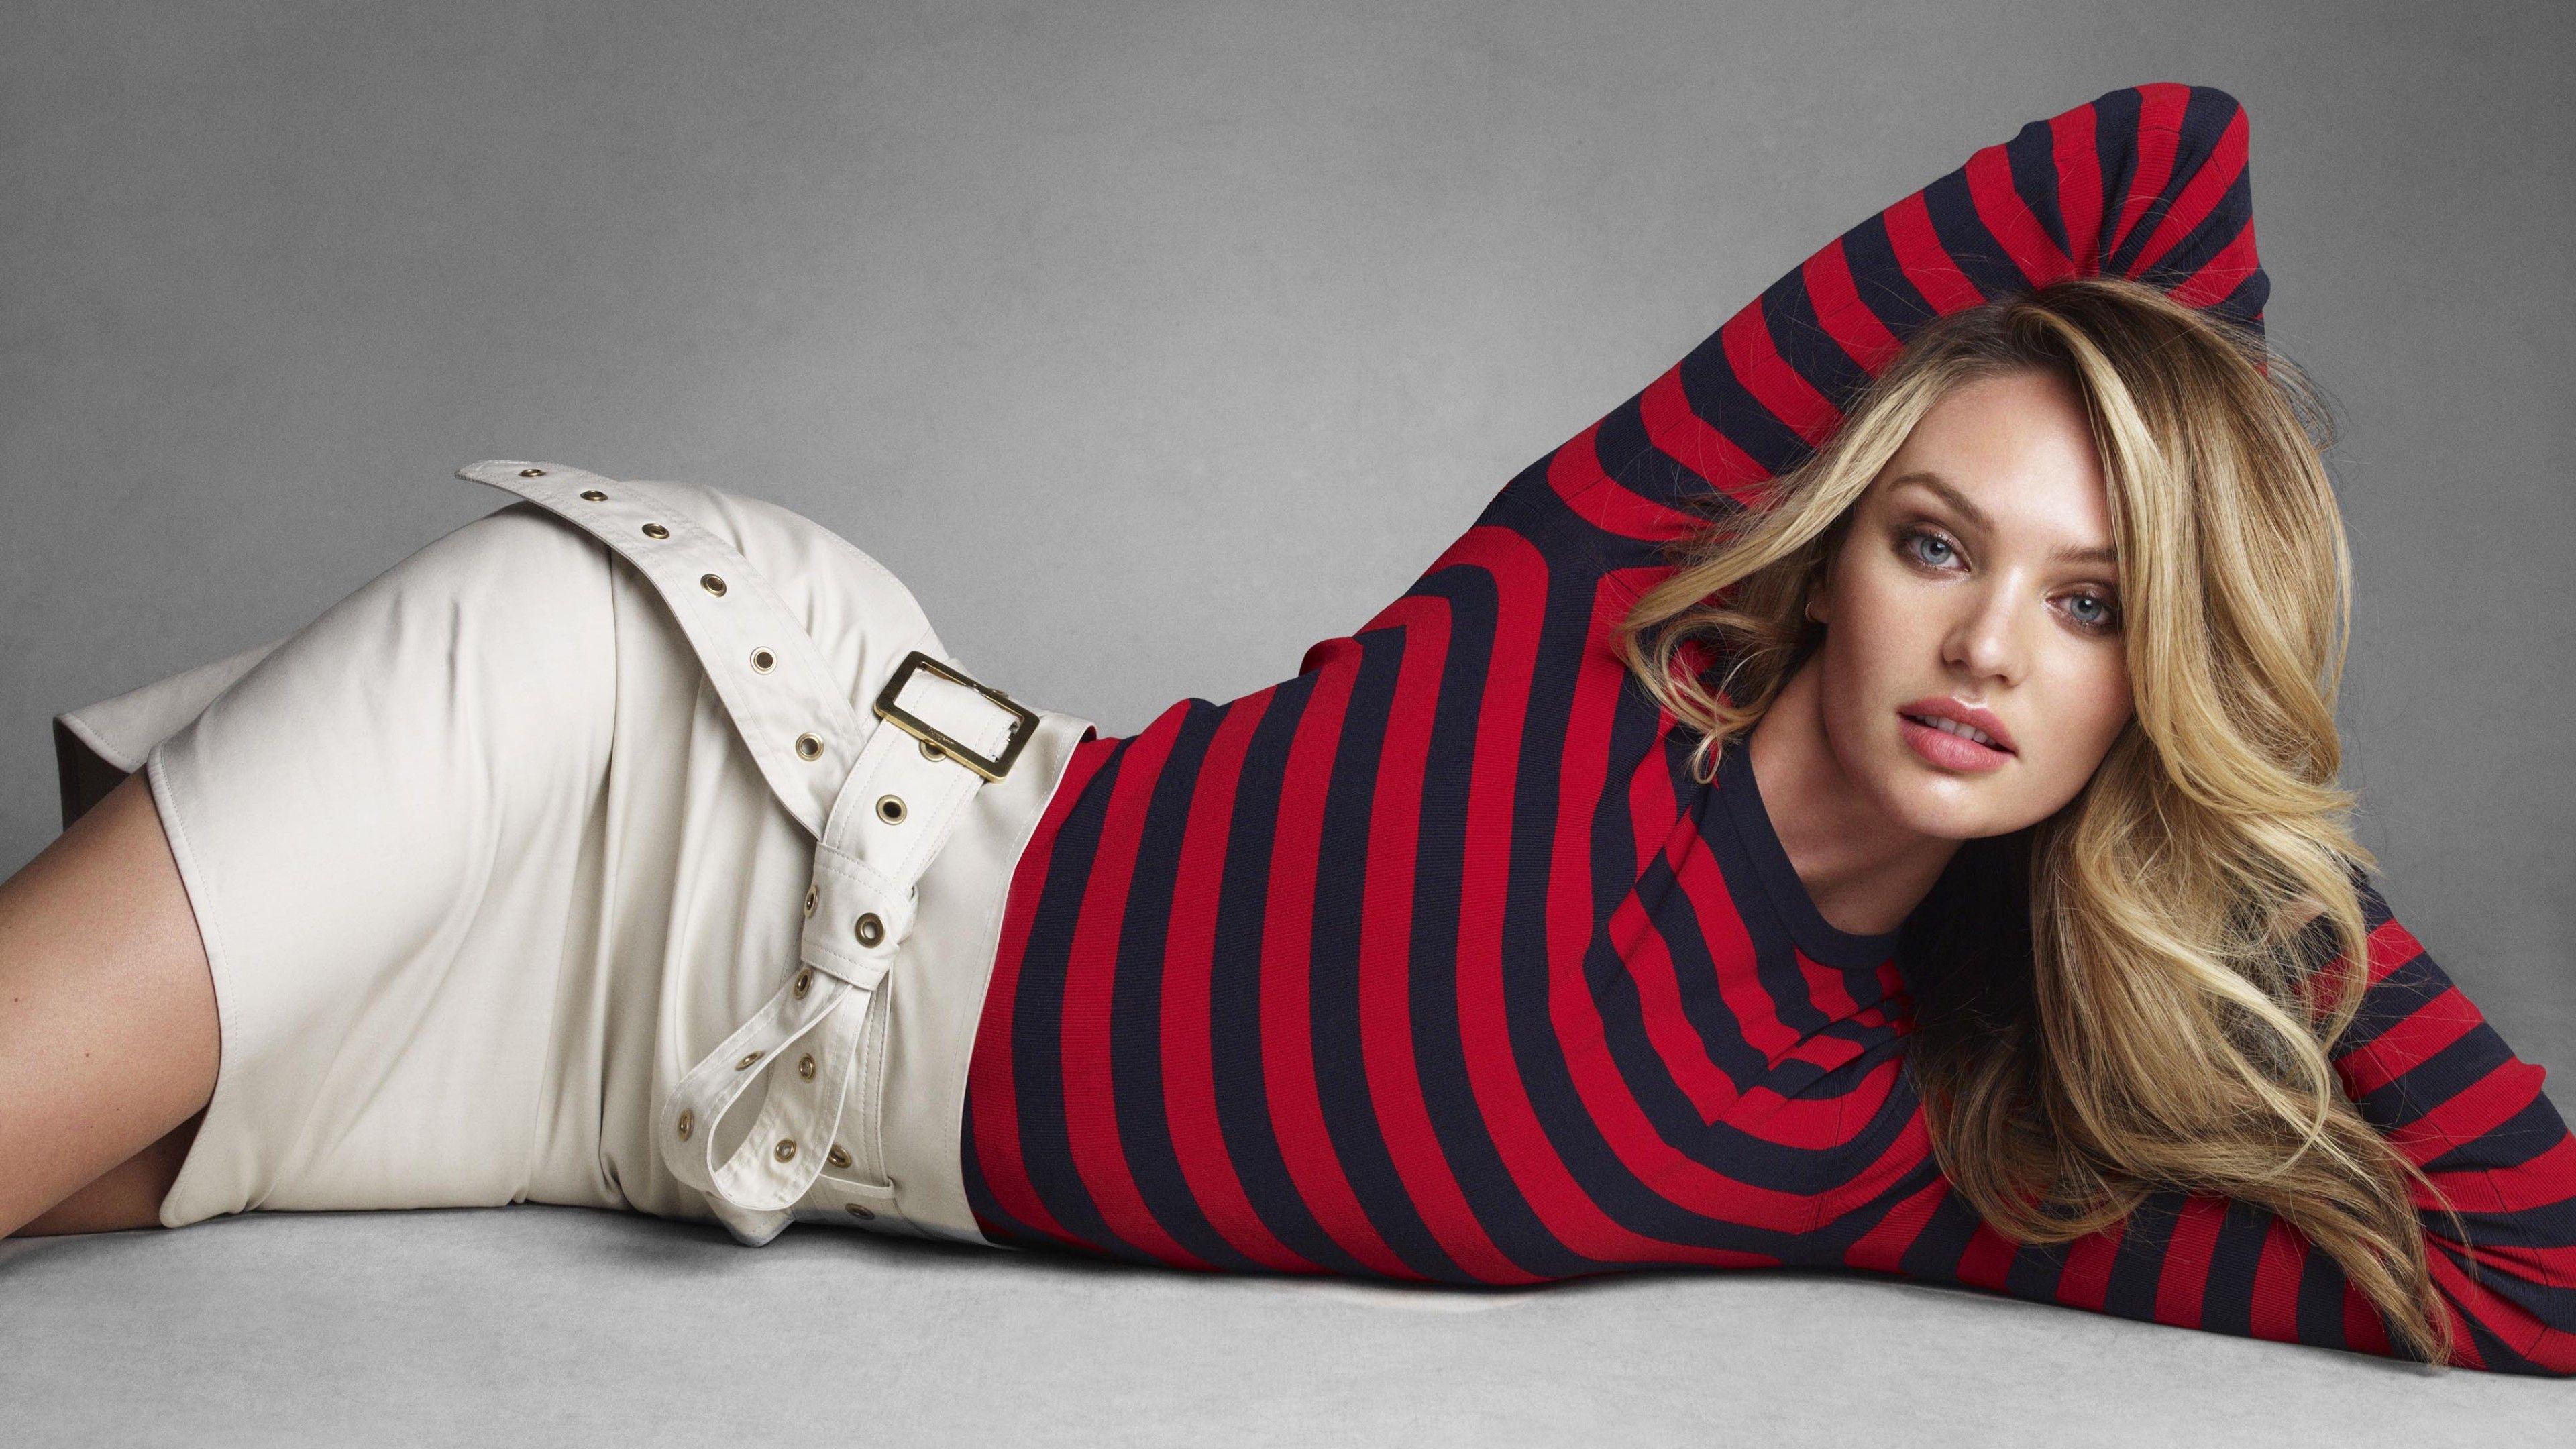 Candice Swanepoel 4k Hd Celebrities 4k Wallpapers Images